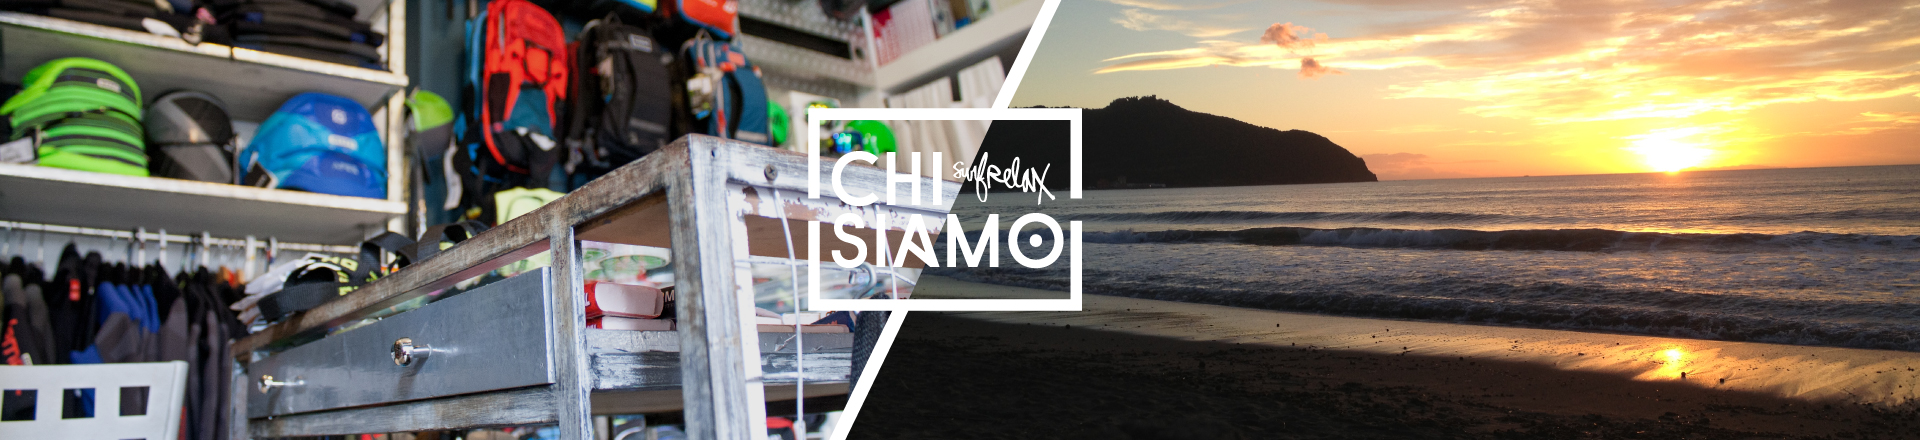 slideshow_chisiamo_2